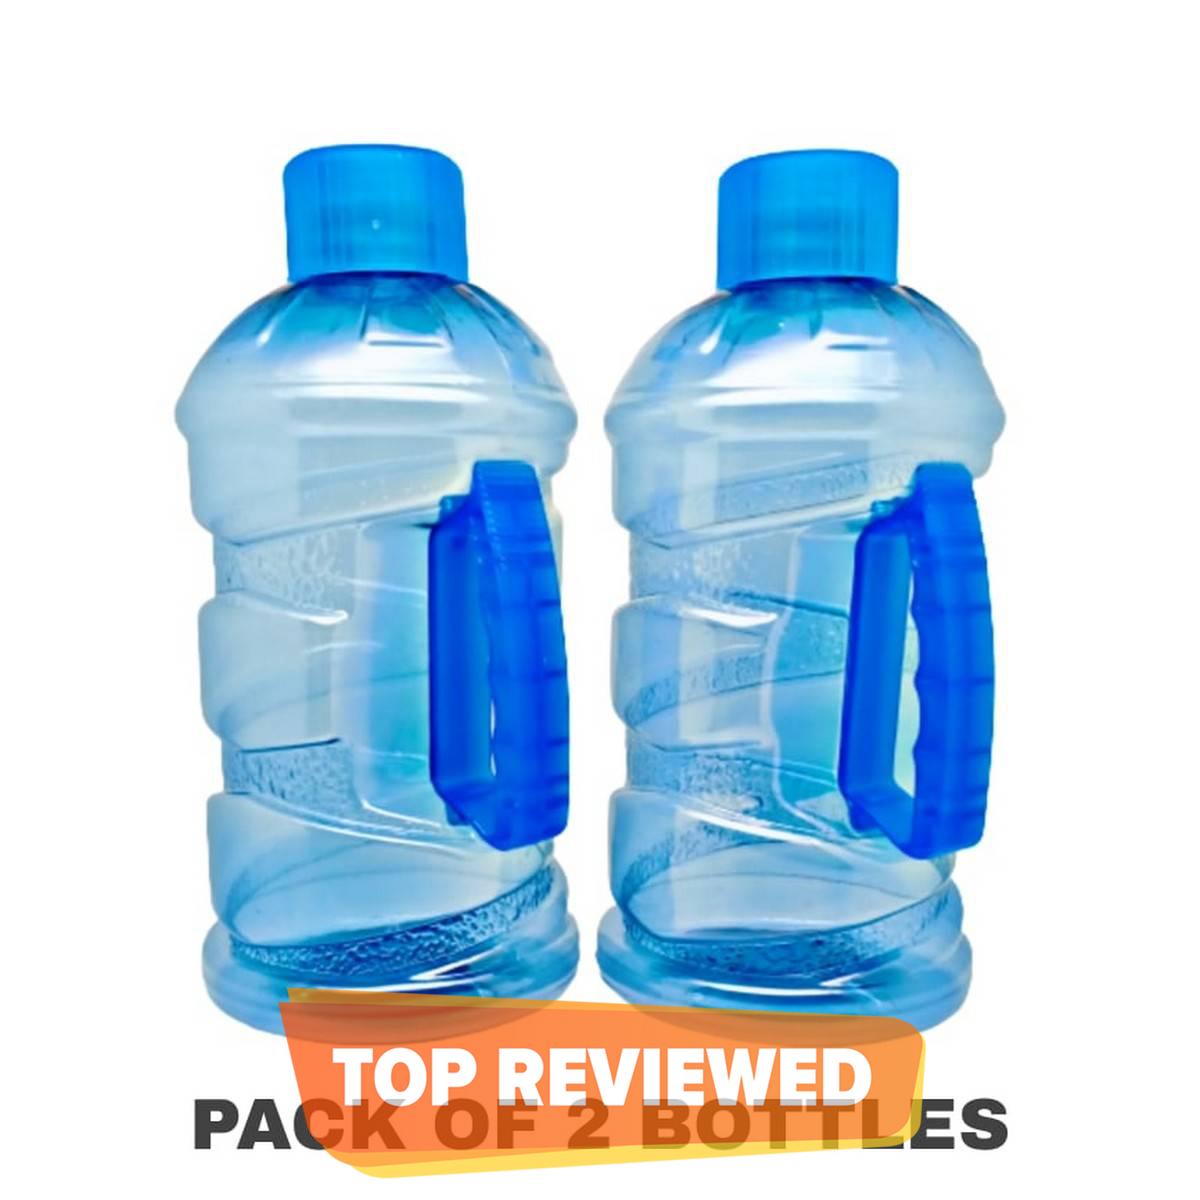 Pack of 2 Plastic Jumbo Super Cool Water Drink Bottles 2000ML - Fridge and Refrigerator water bottles